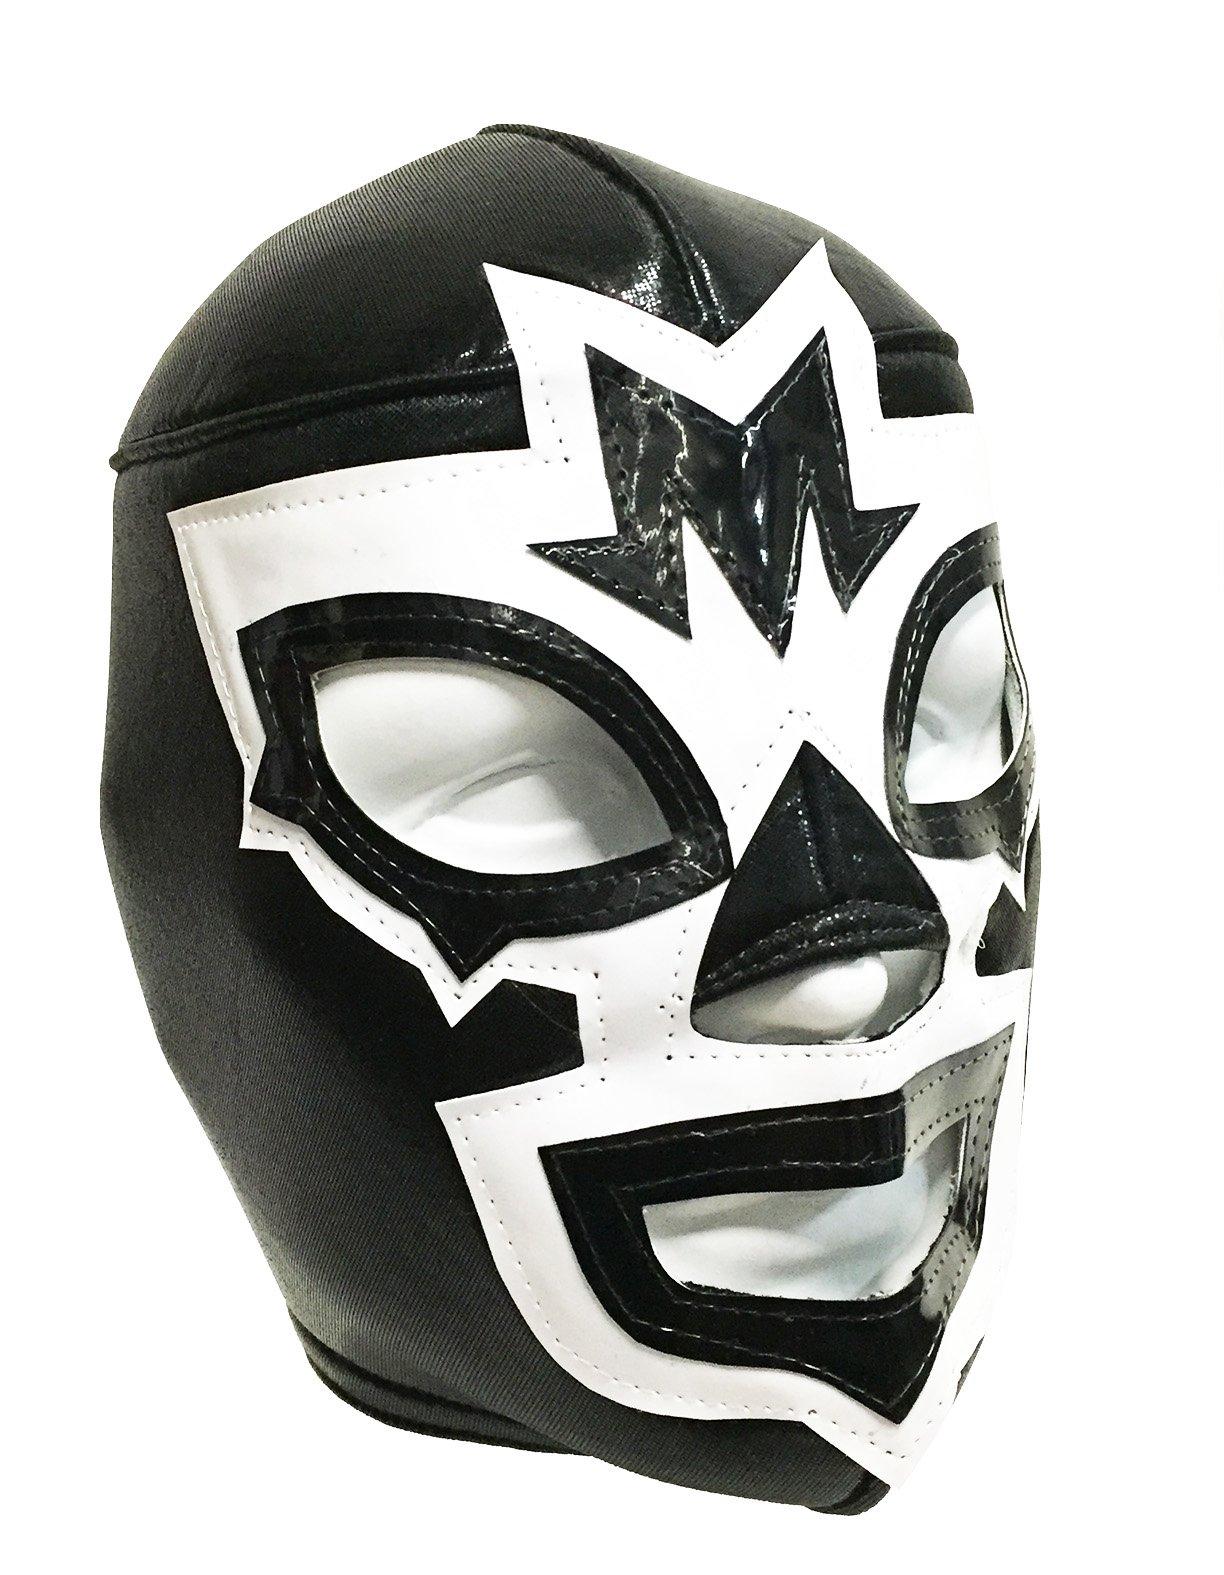 MASK MANIAC Adult Lucha Libre Wrestling Mask (pro-fit) Costume Wear - Black/White